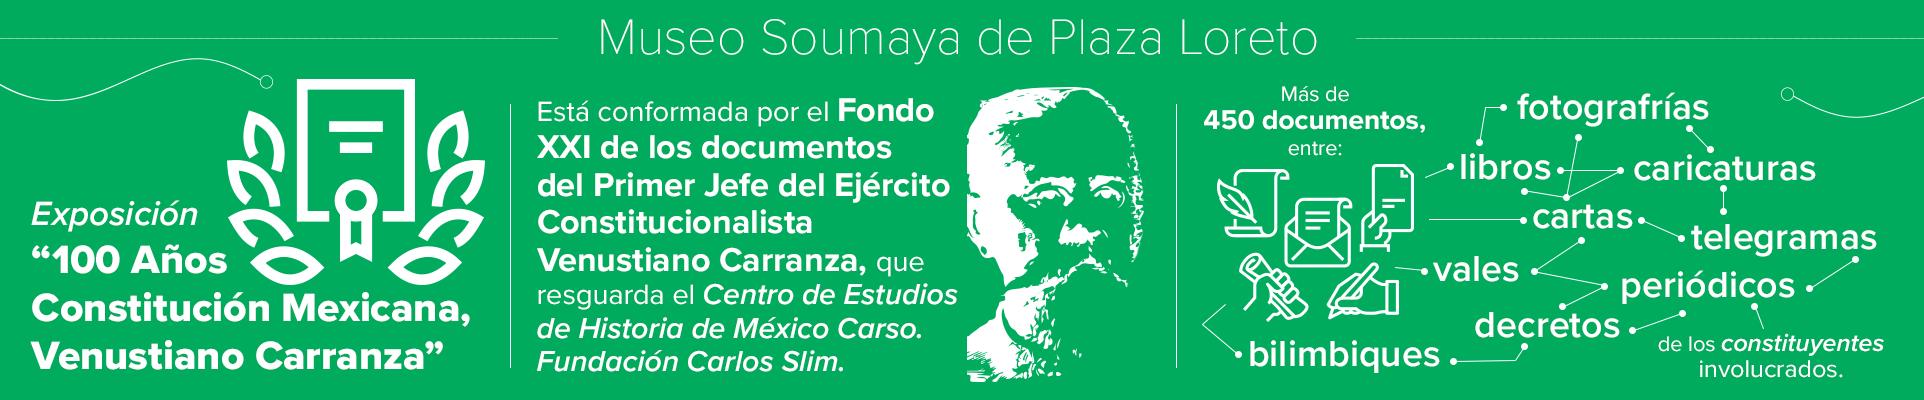 Museo Soumaya de Plaza Loreto